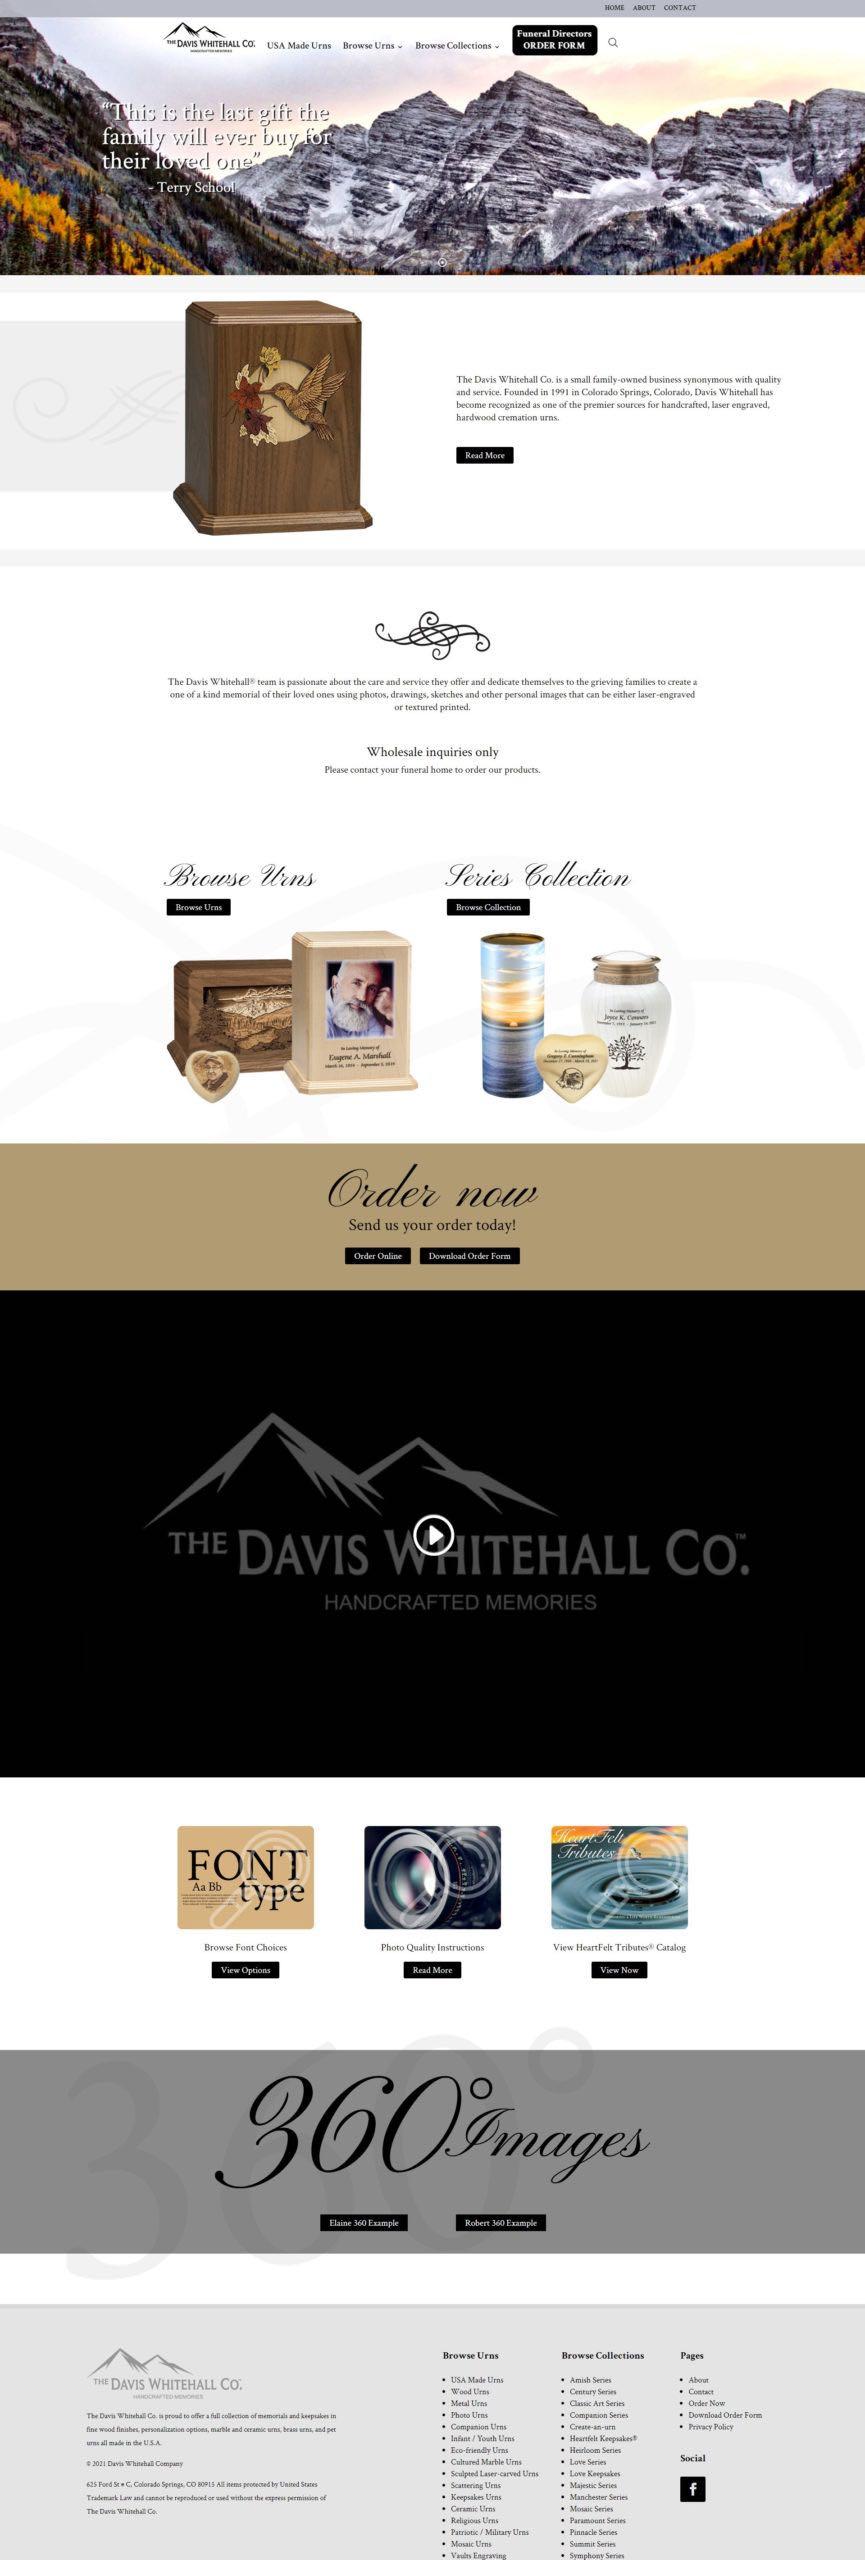 Davis Whitehall Urn Company